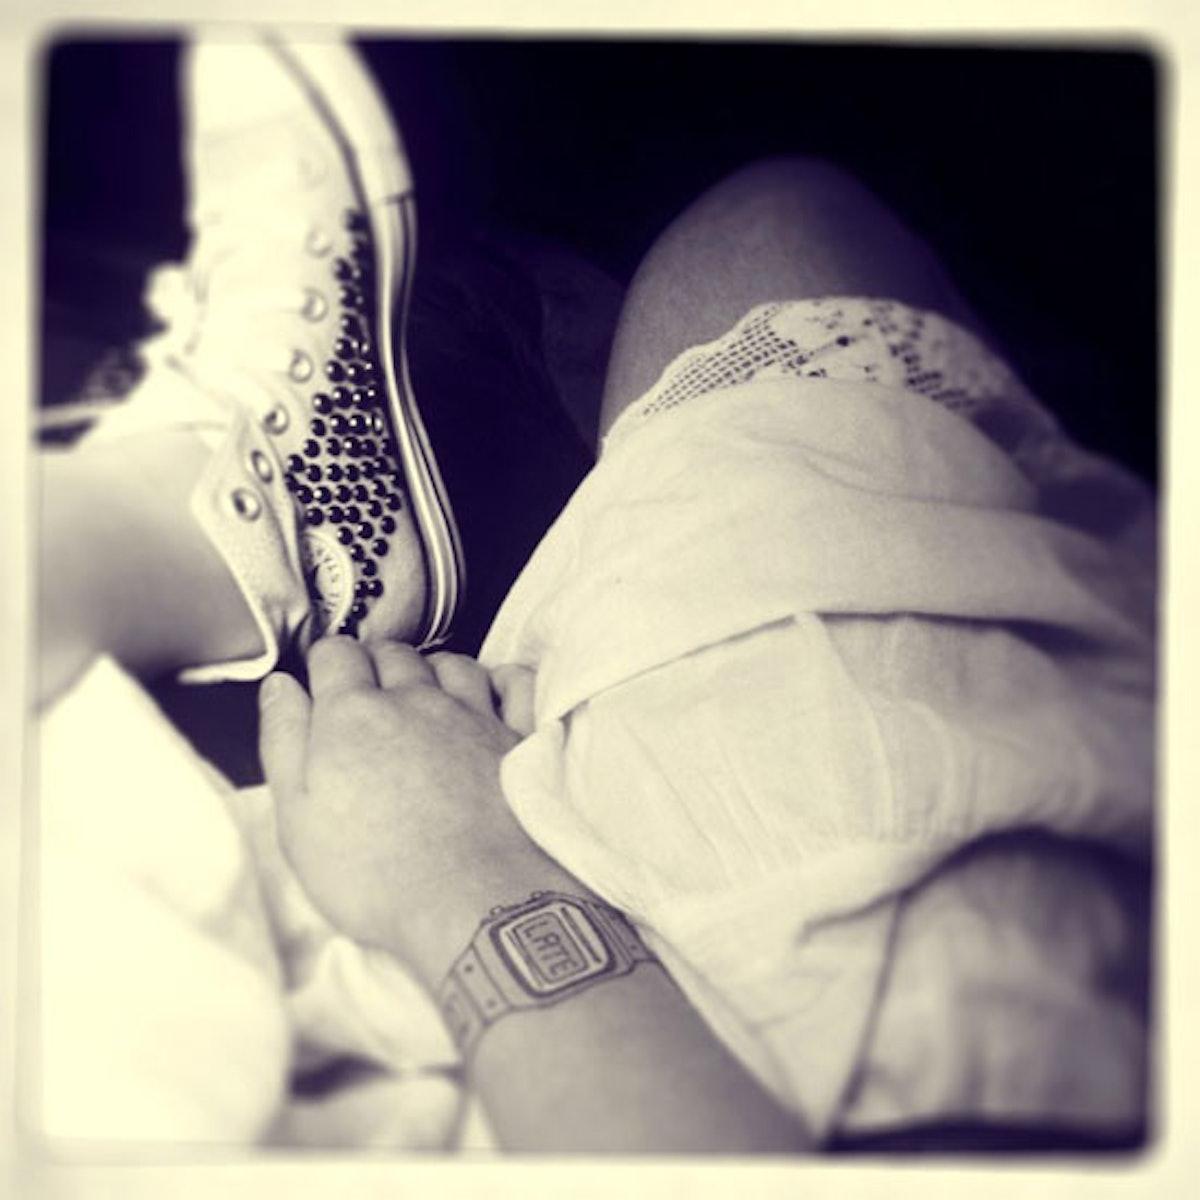 blog-fashion-temp-tattoos-01.jpg